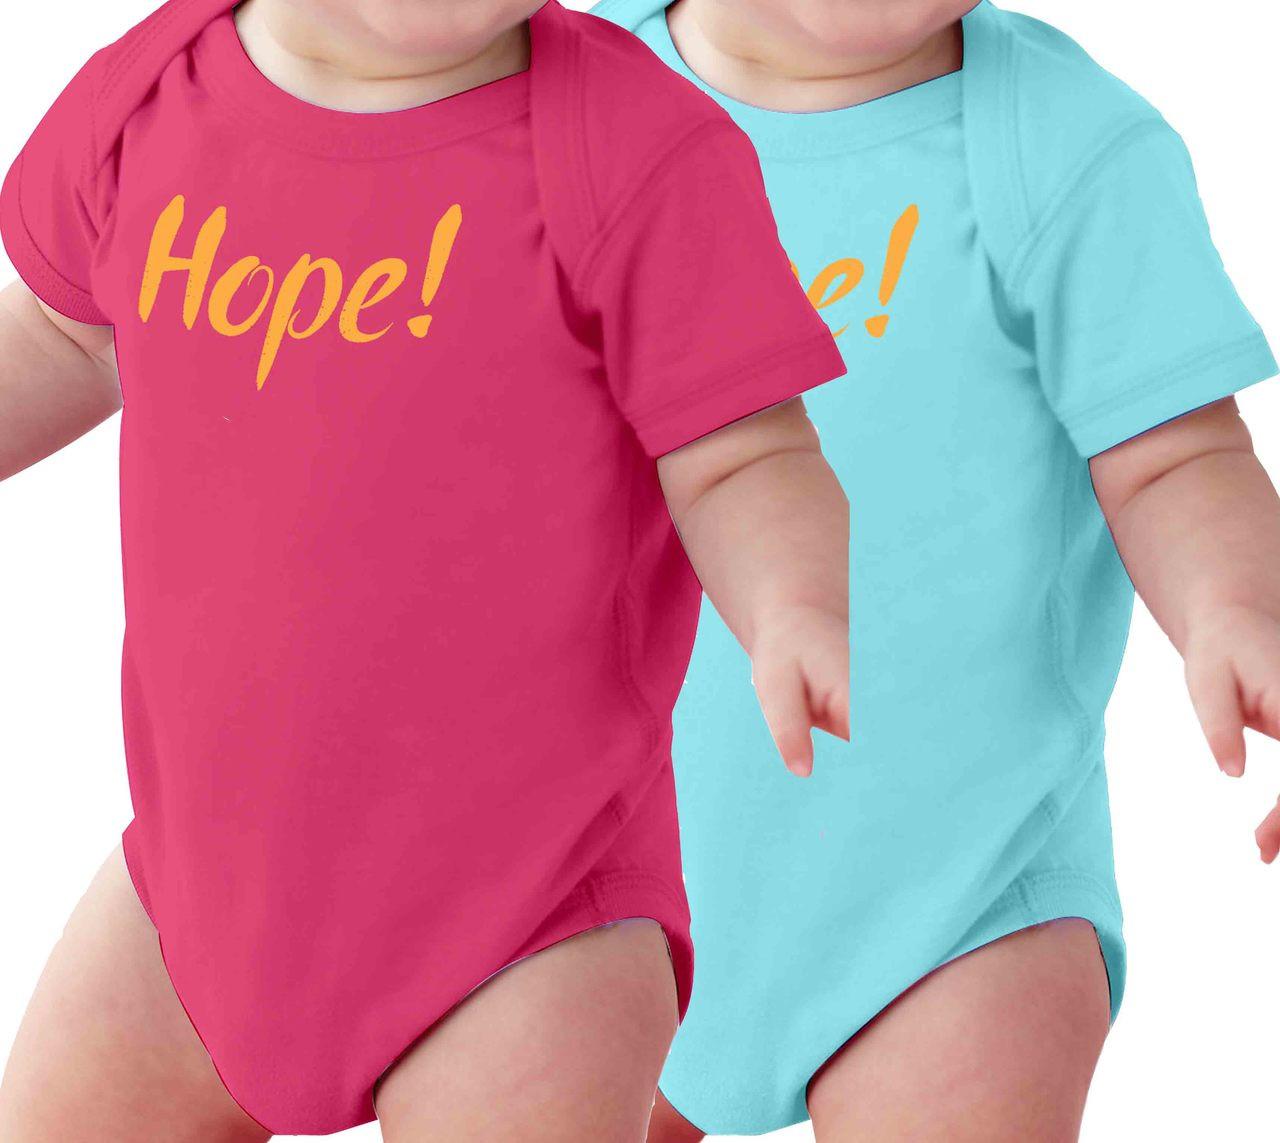 902663dd7 Hope! Baby Onesie - Catholic to the Max - Online Catholic Store